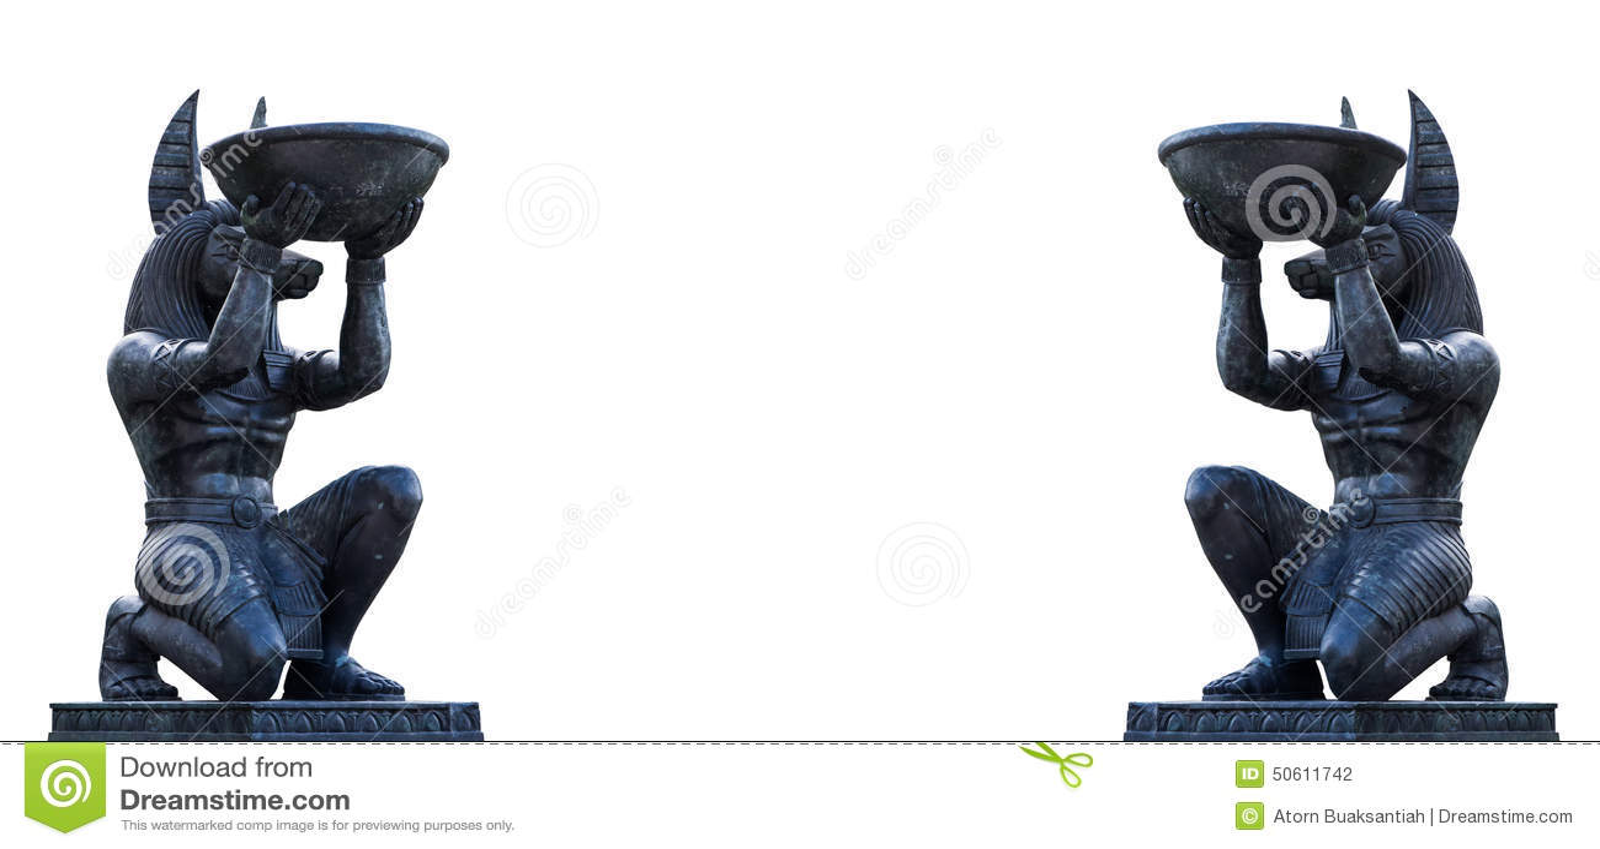 Couple Egyptian ancient art Anubis Sculpture Figurine Statue